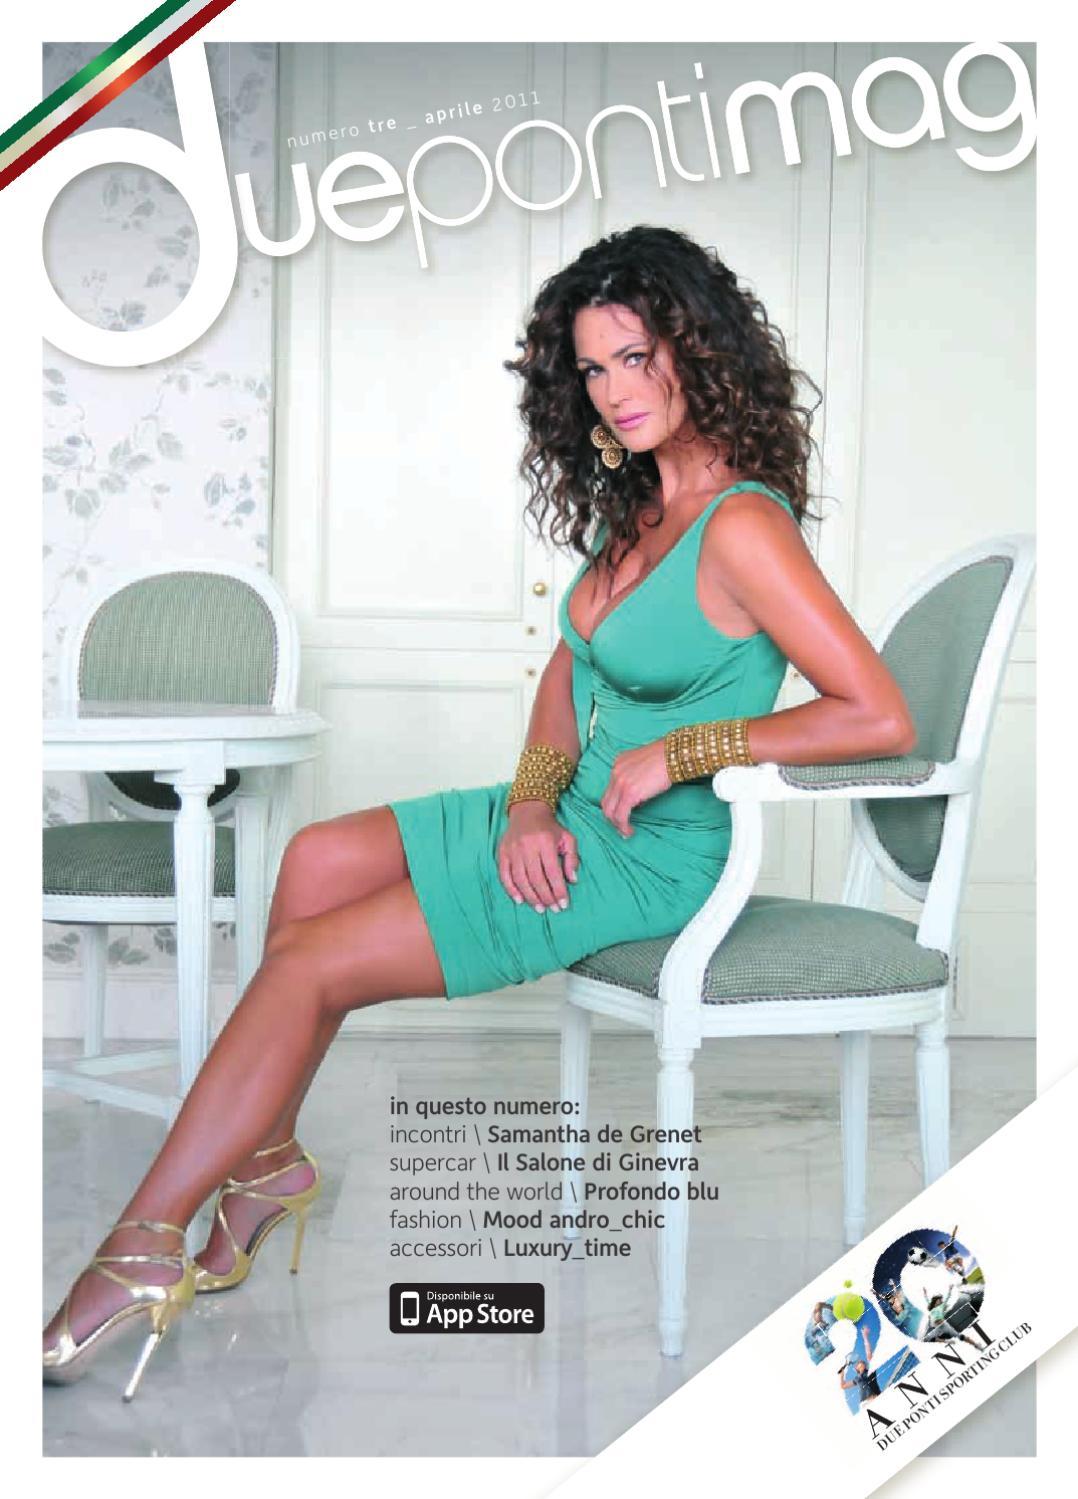 cab2180f1afd5 Due Ponti Magazine Aprile 2011 by Luana Briglia - issuu